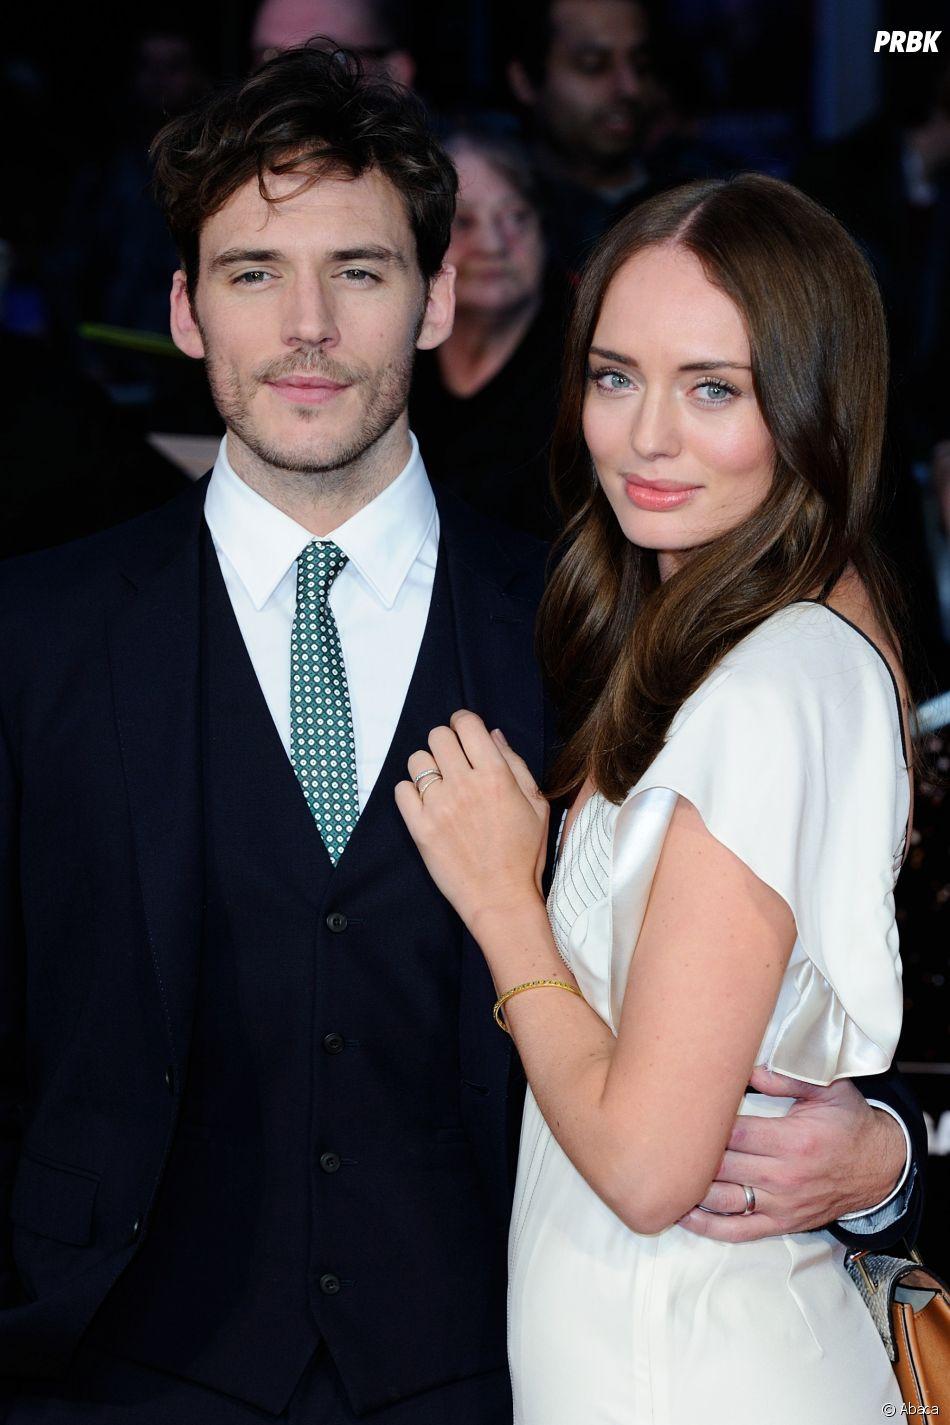 Sam Claflin et sa femme Laura Haddock